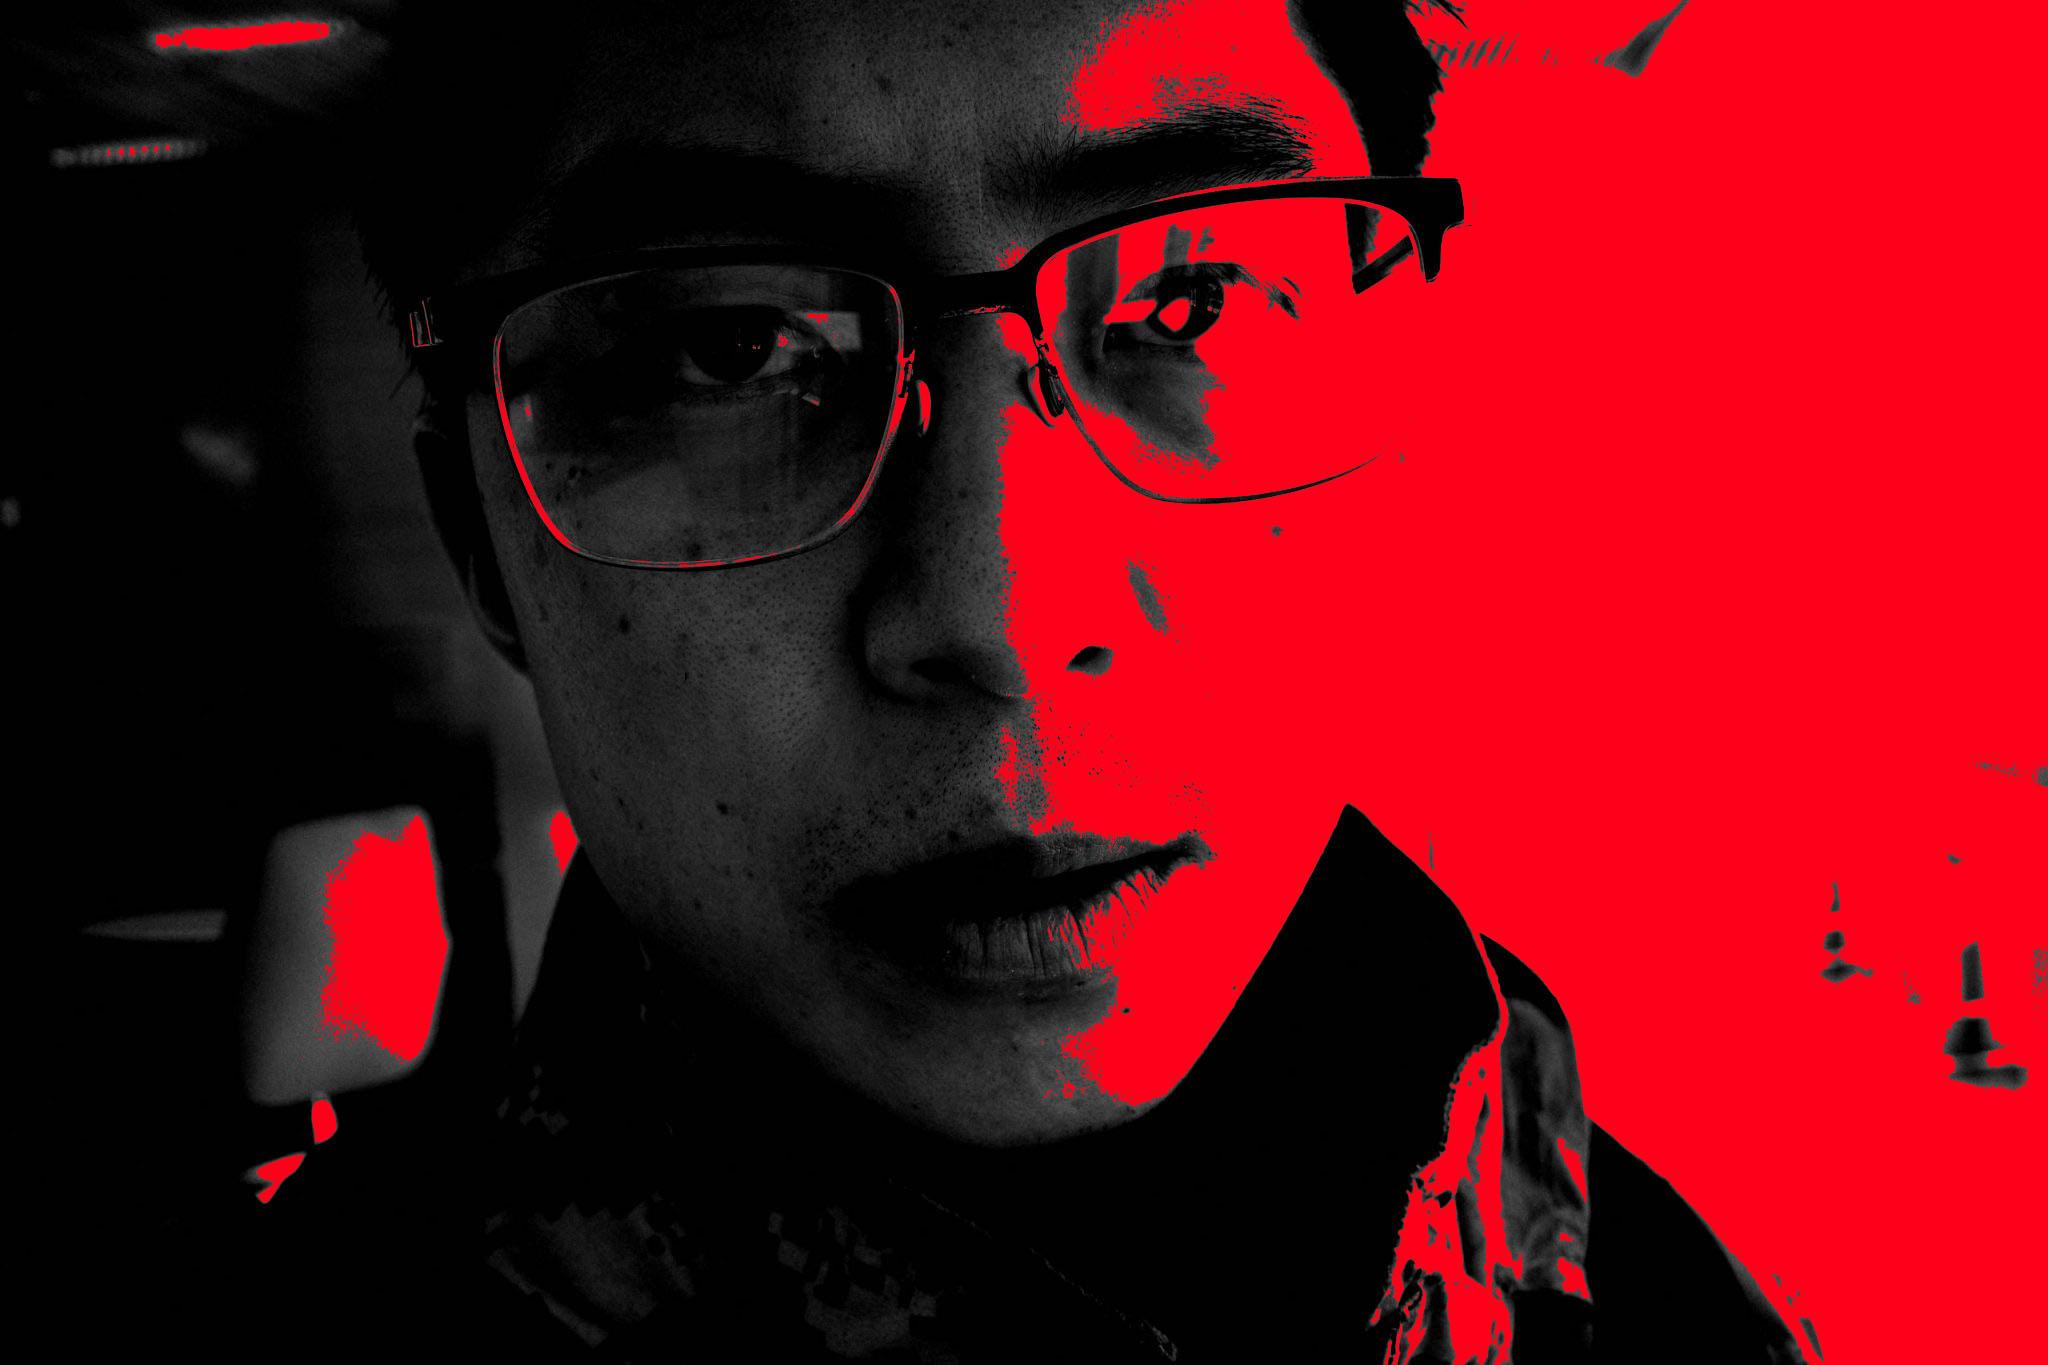 Eric kim selfie red black